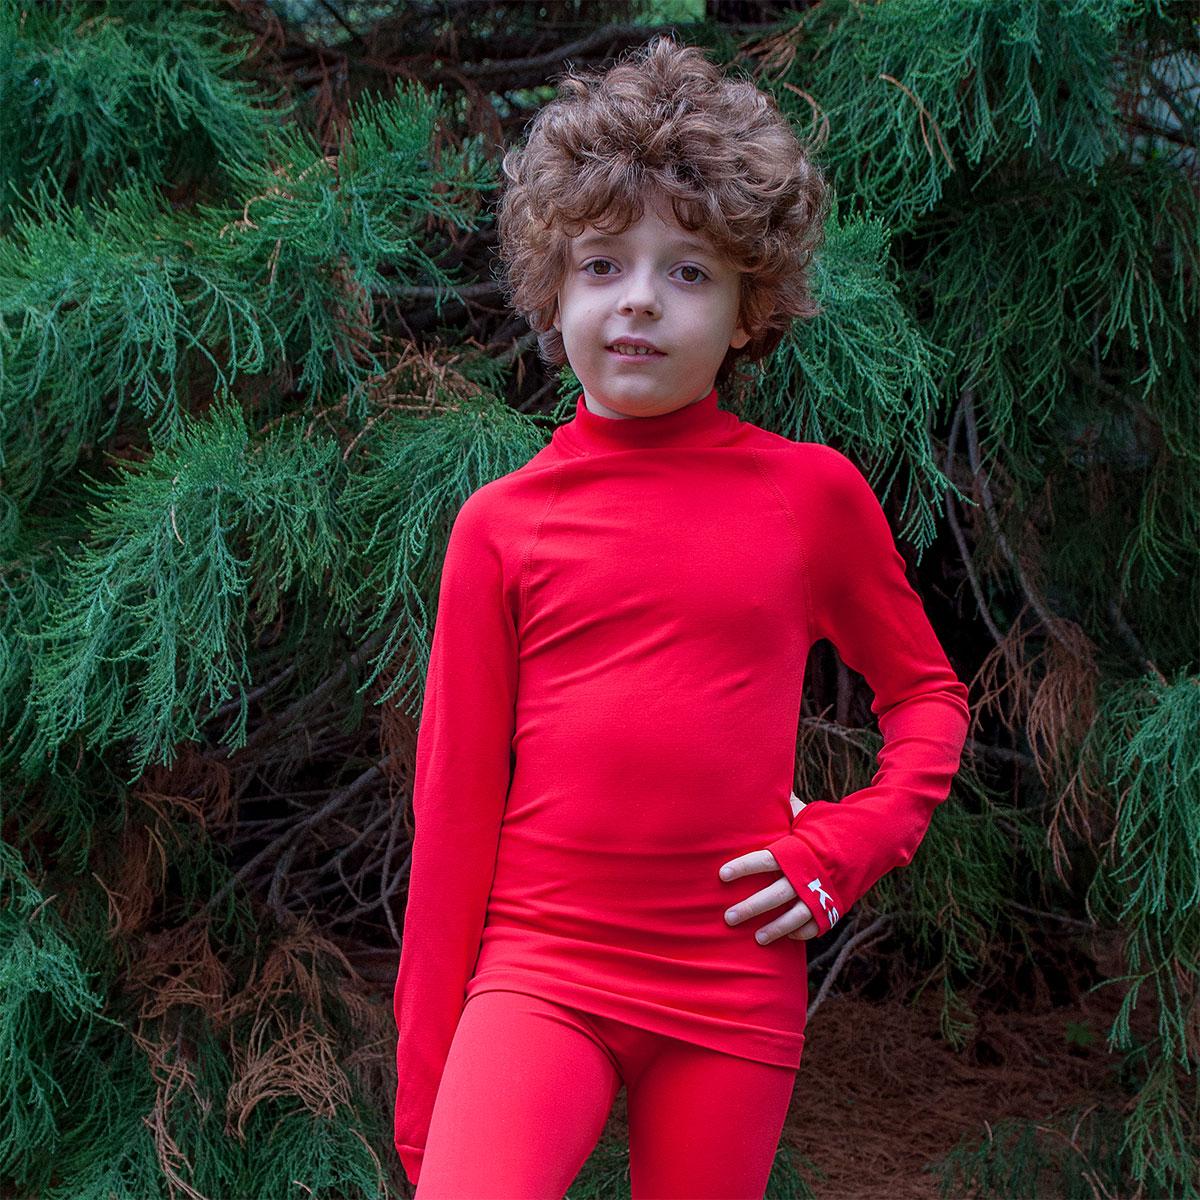 детска термо блуза ksport червена - снимка 2